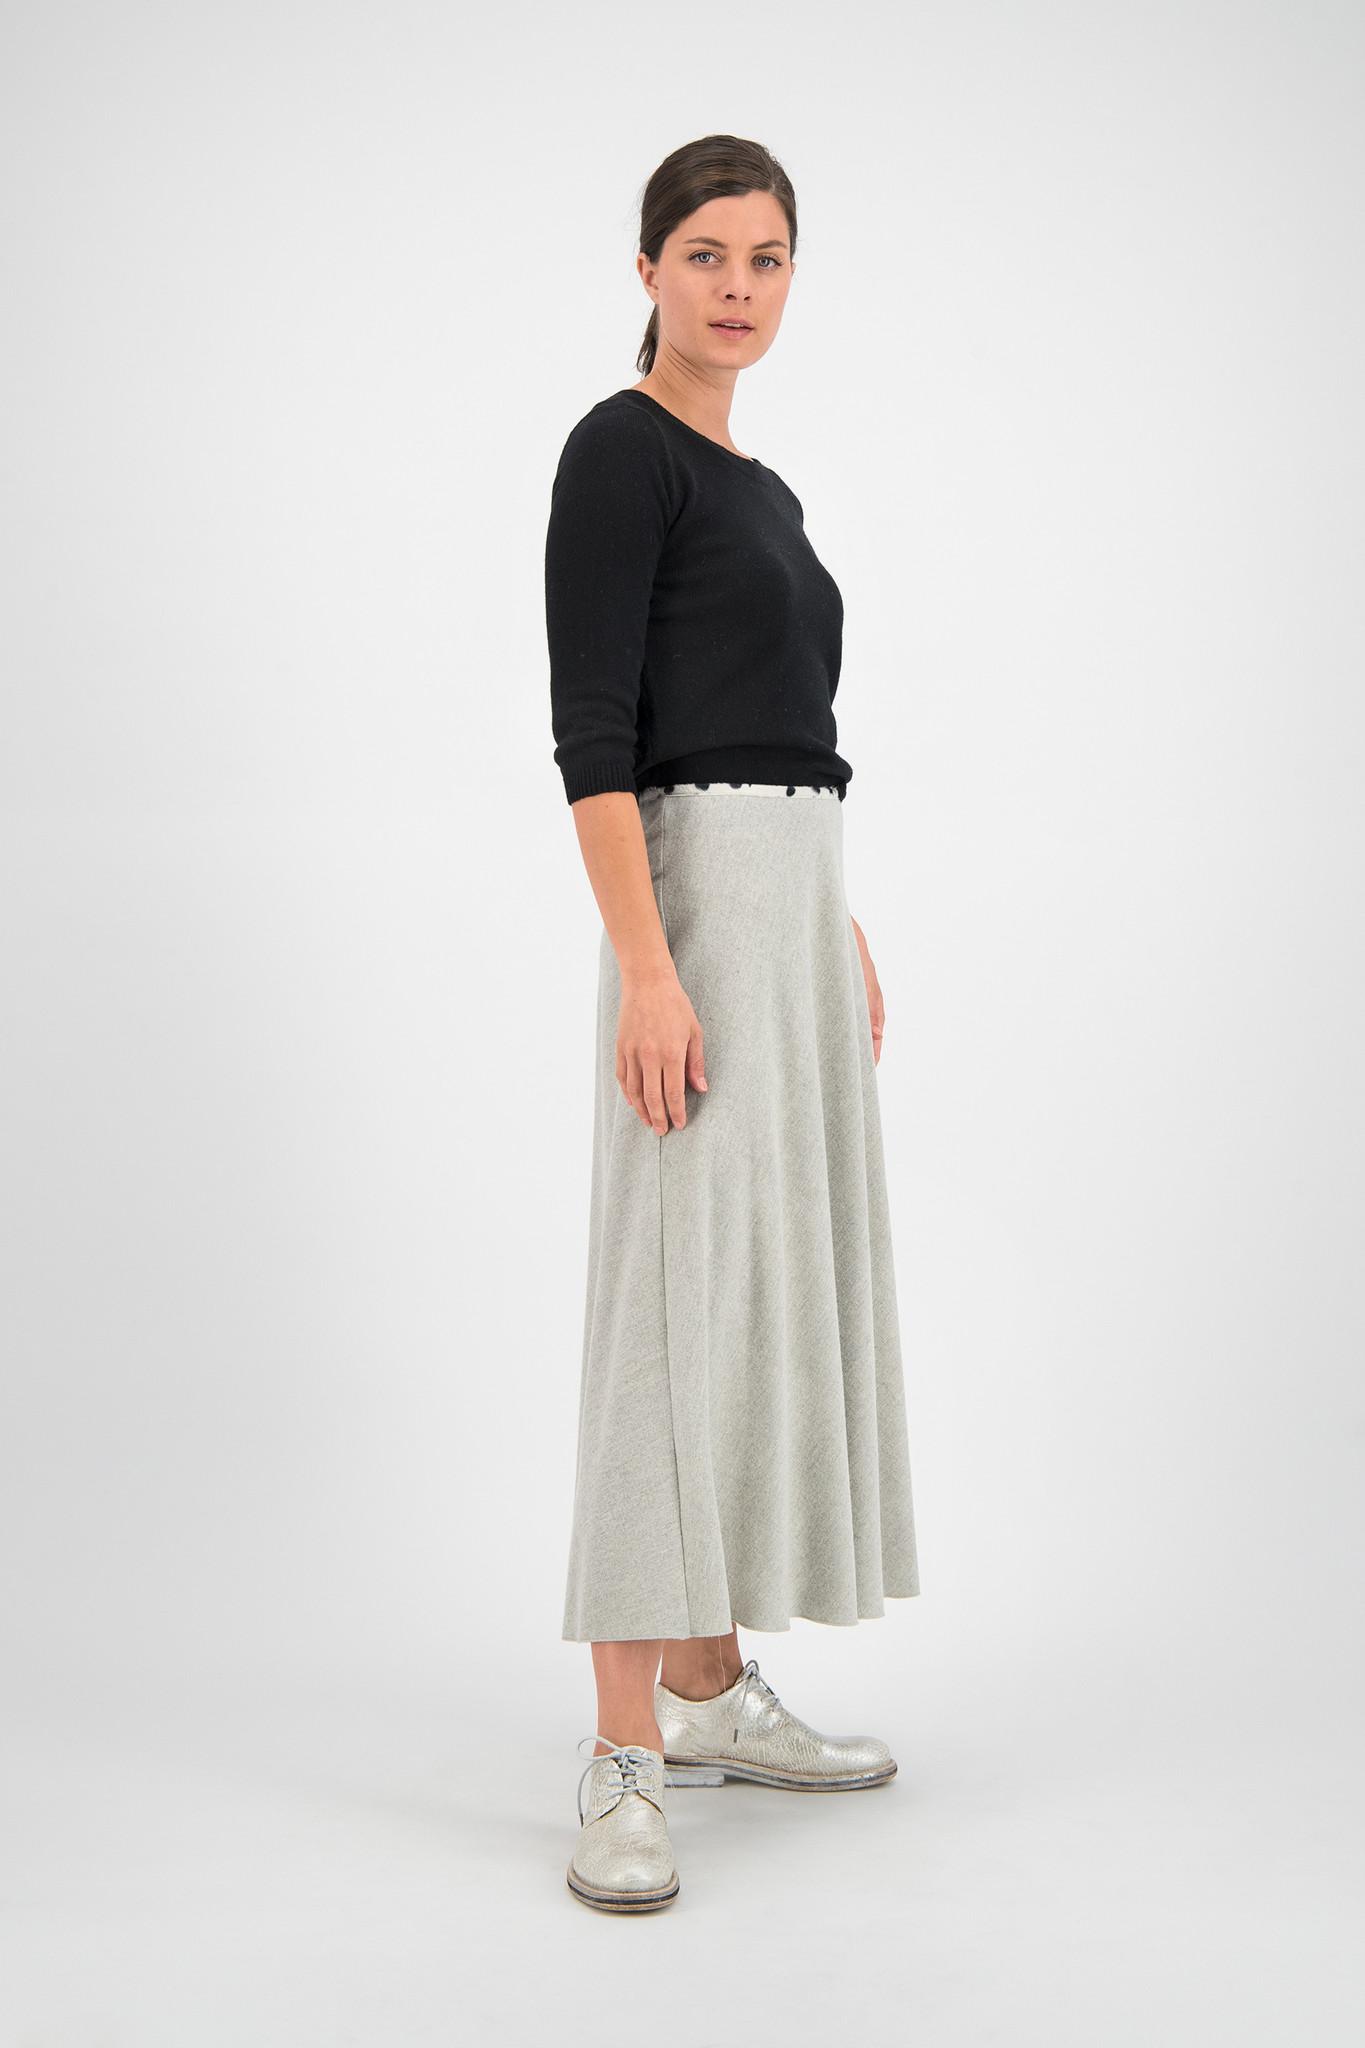 SYLVER Flannel Skirt - Light Grey